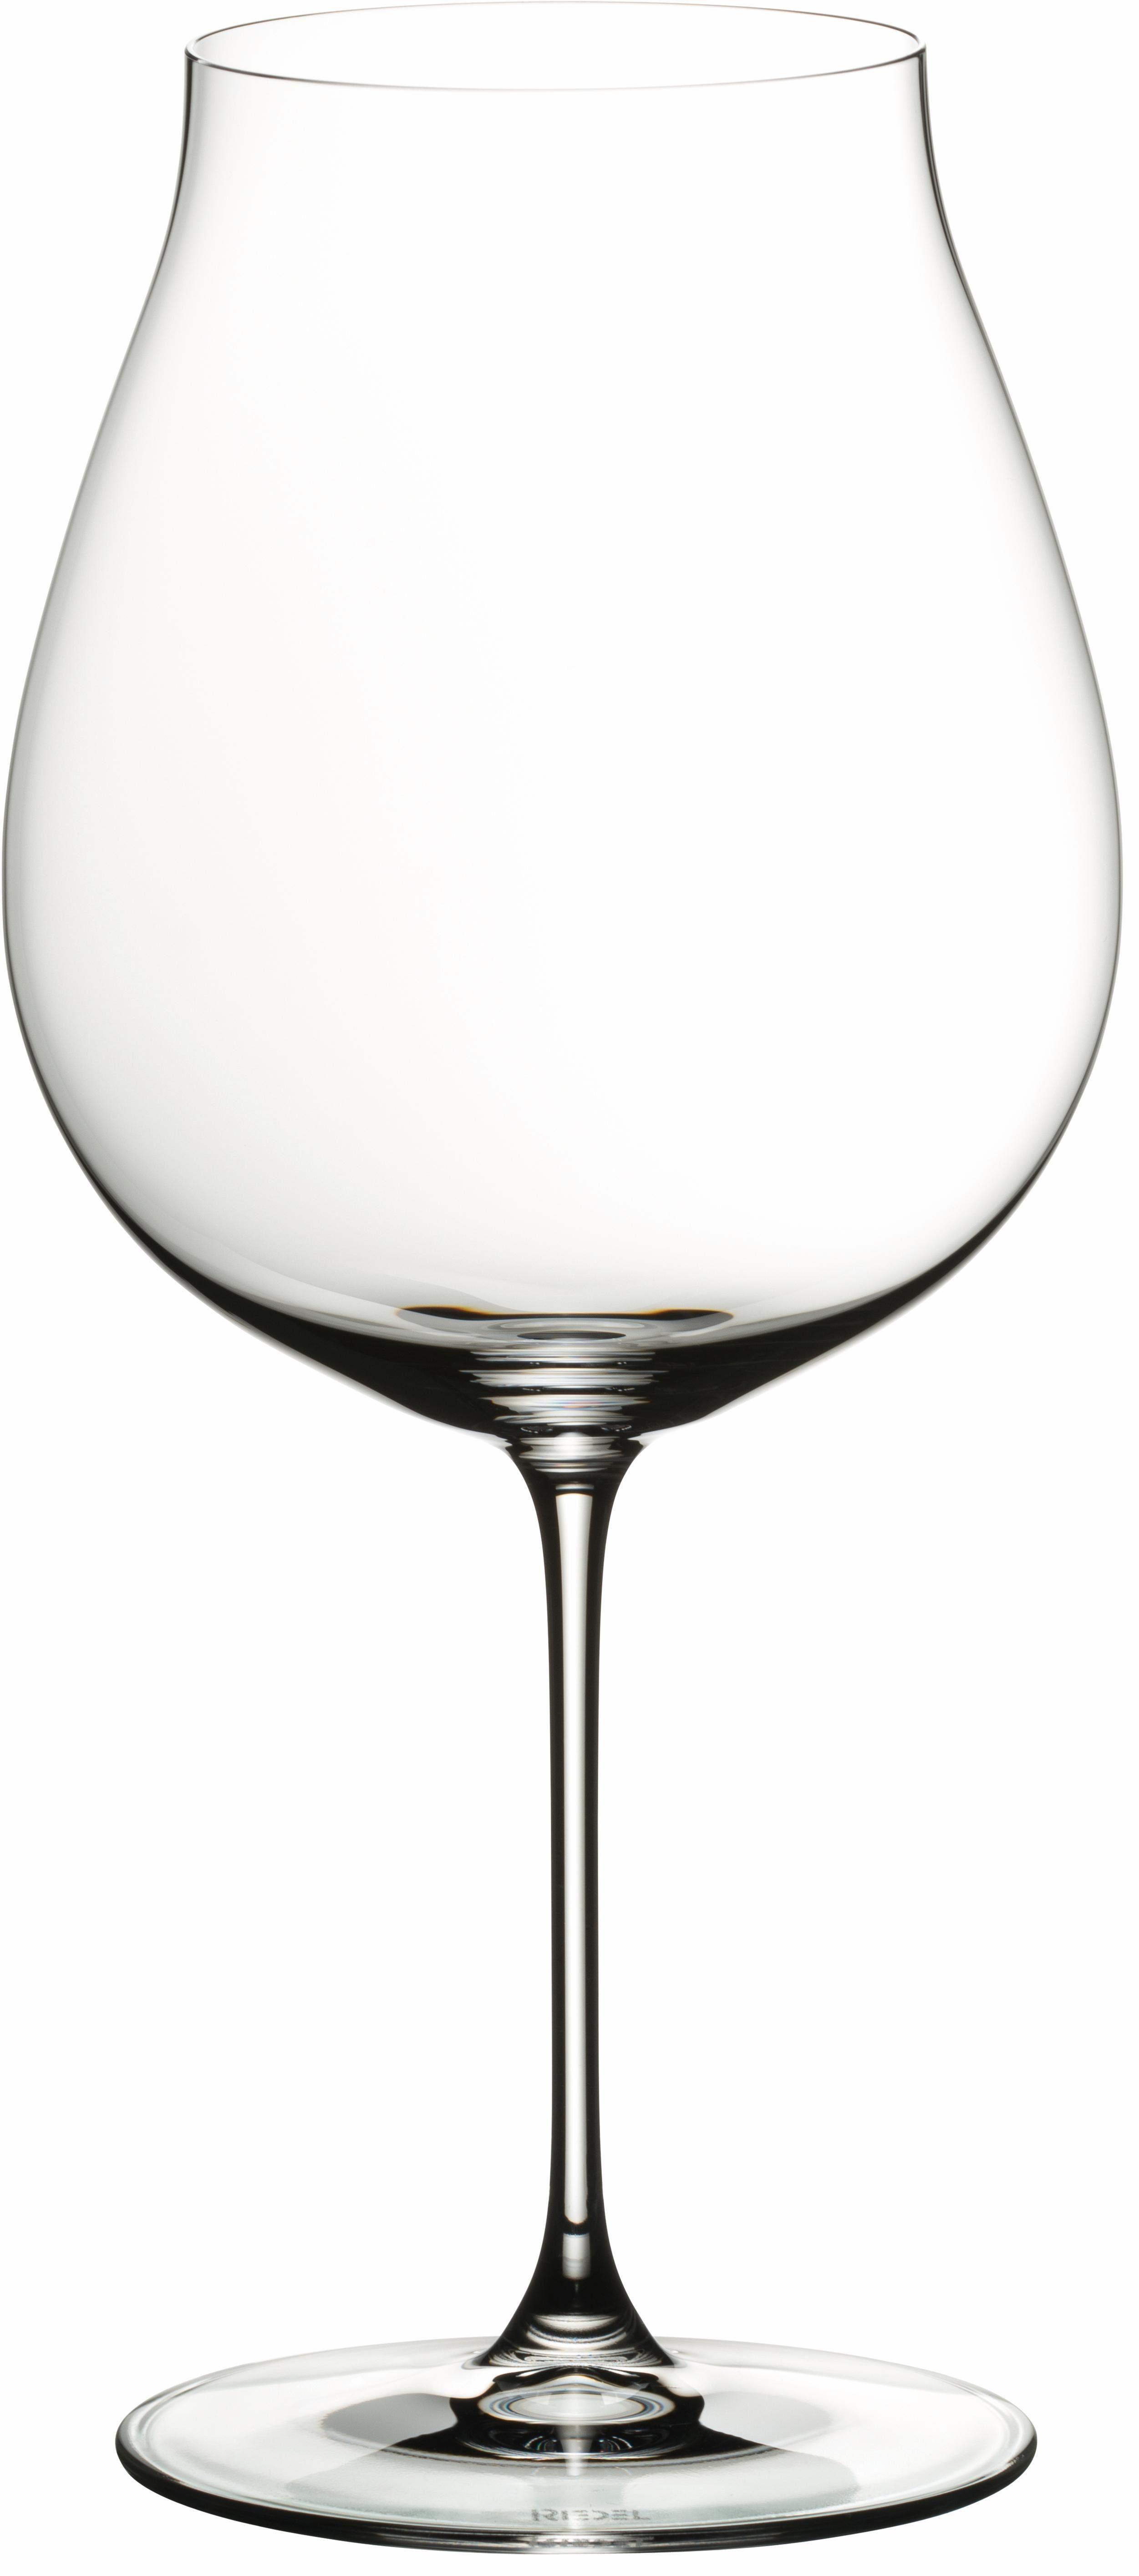 RIEDEL GLASS Wein-Glas, 2er Set, Made in Germany, »Veritas«